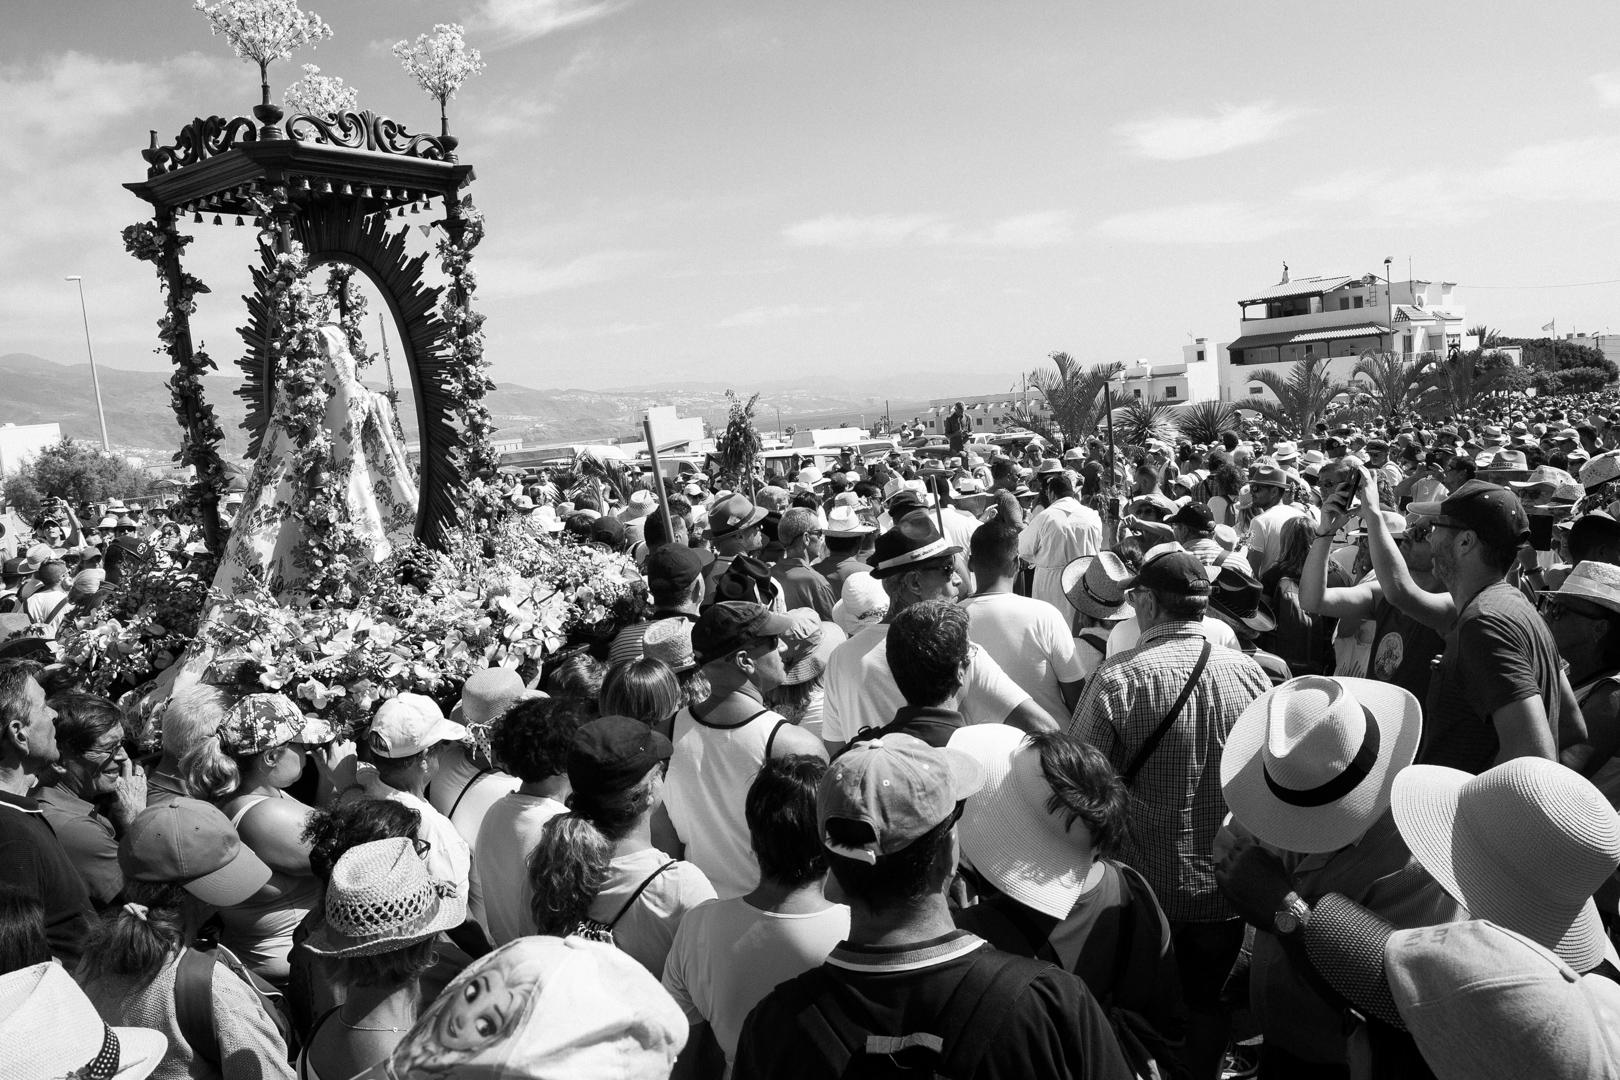 Romeria, Guimar - Socorro; Masses carrying La Virgen